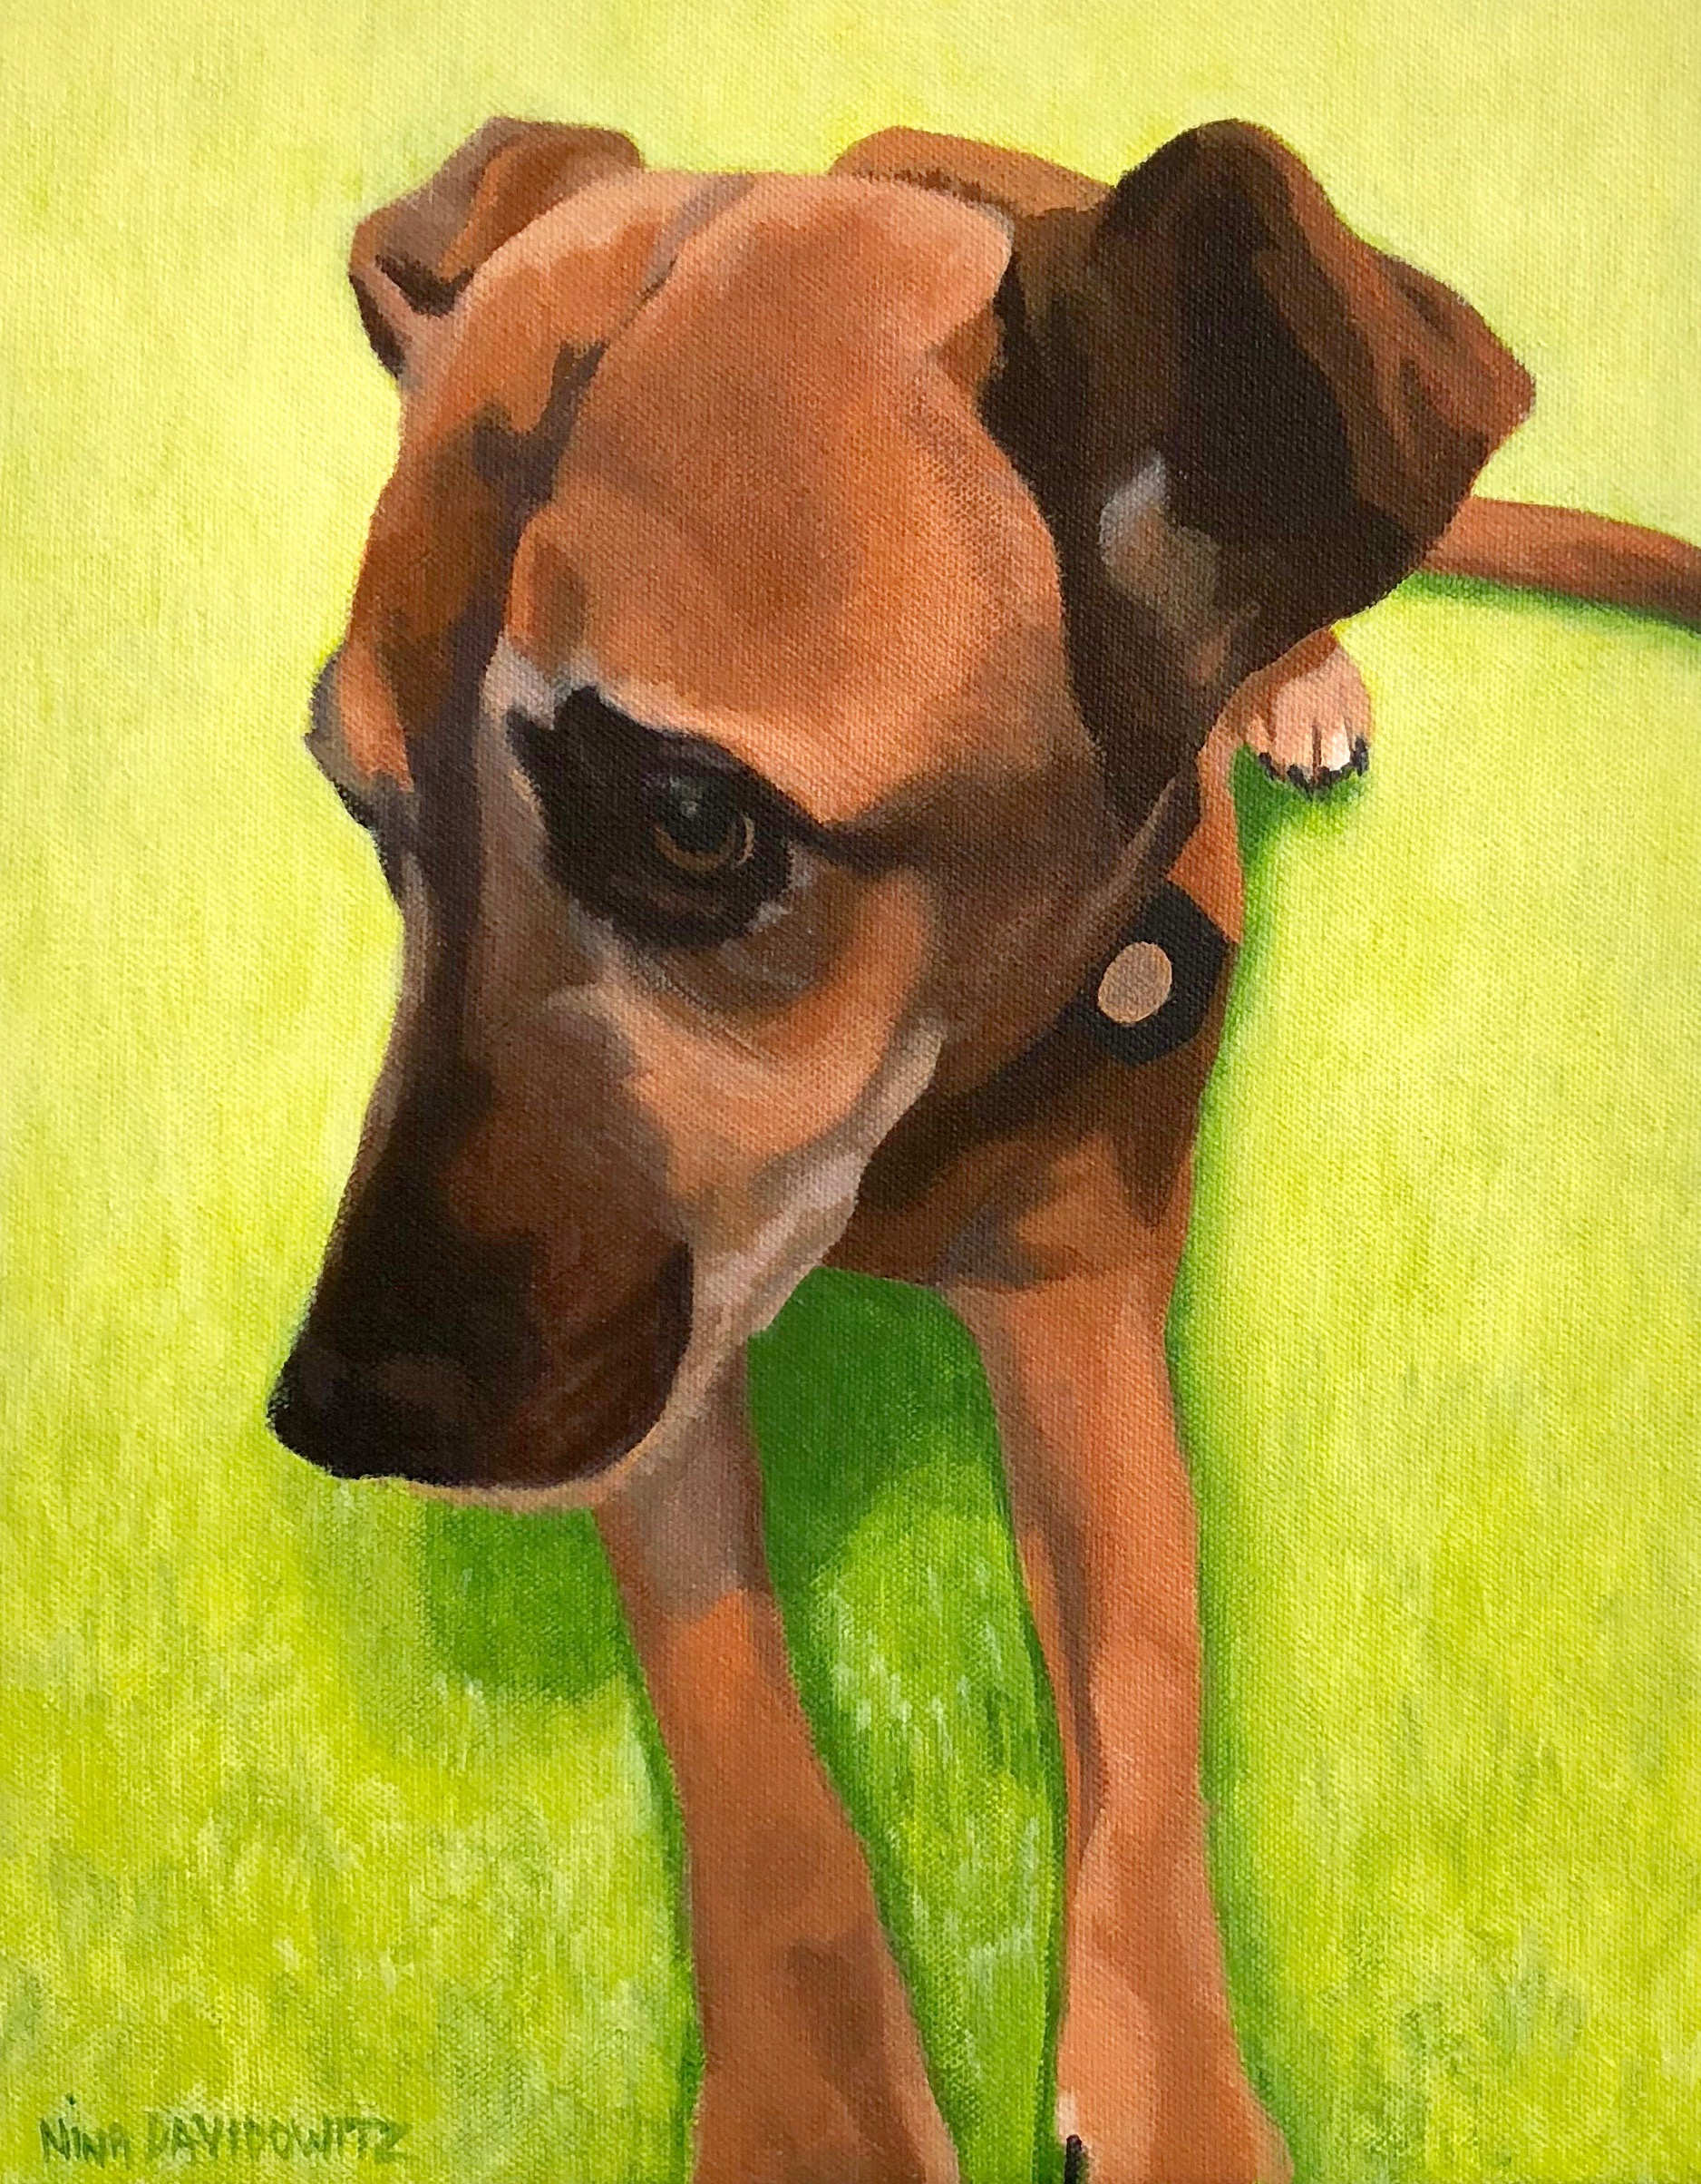 """Portrait of Coco"", acrylic on canvas, 11"" x 14"", 2018"